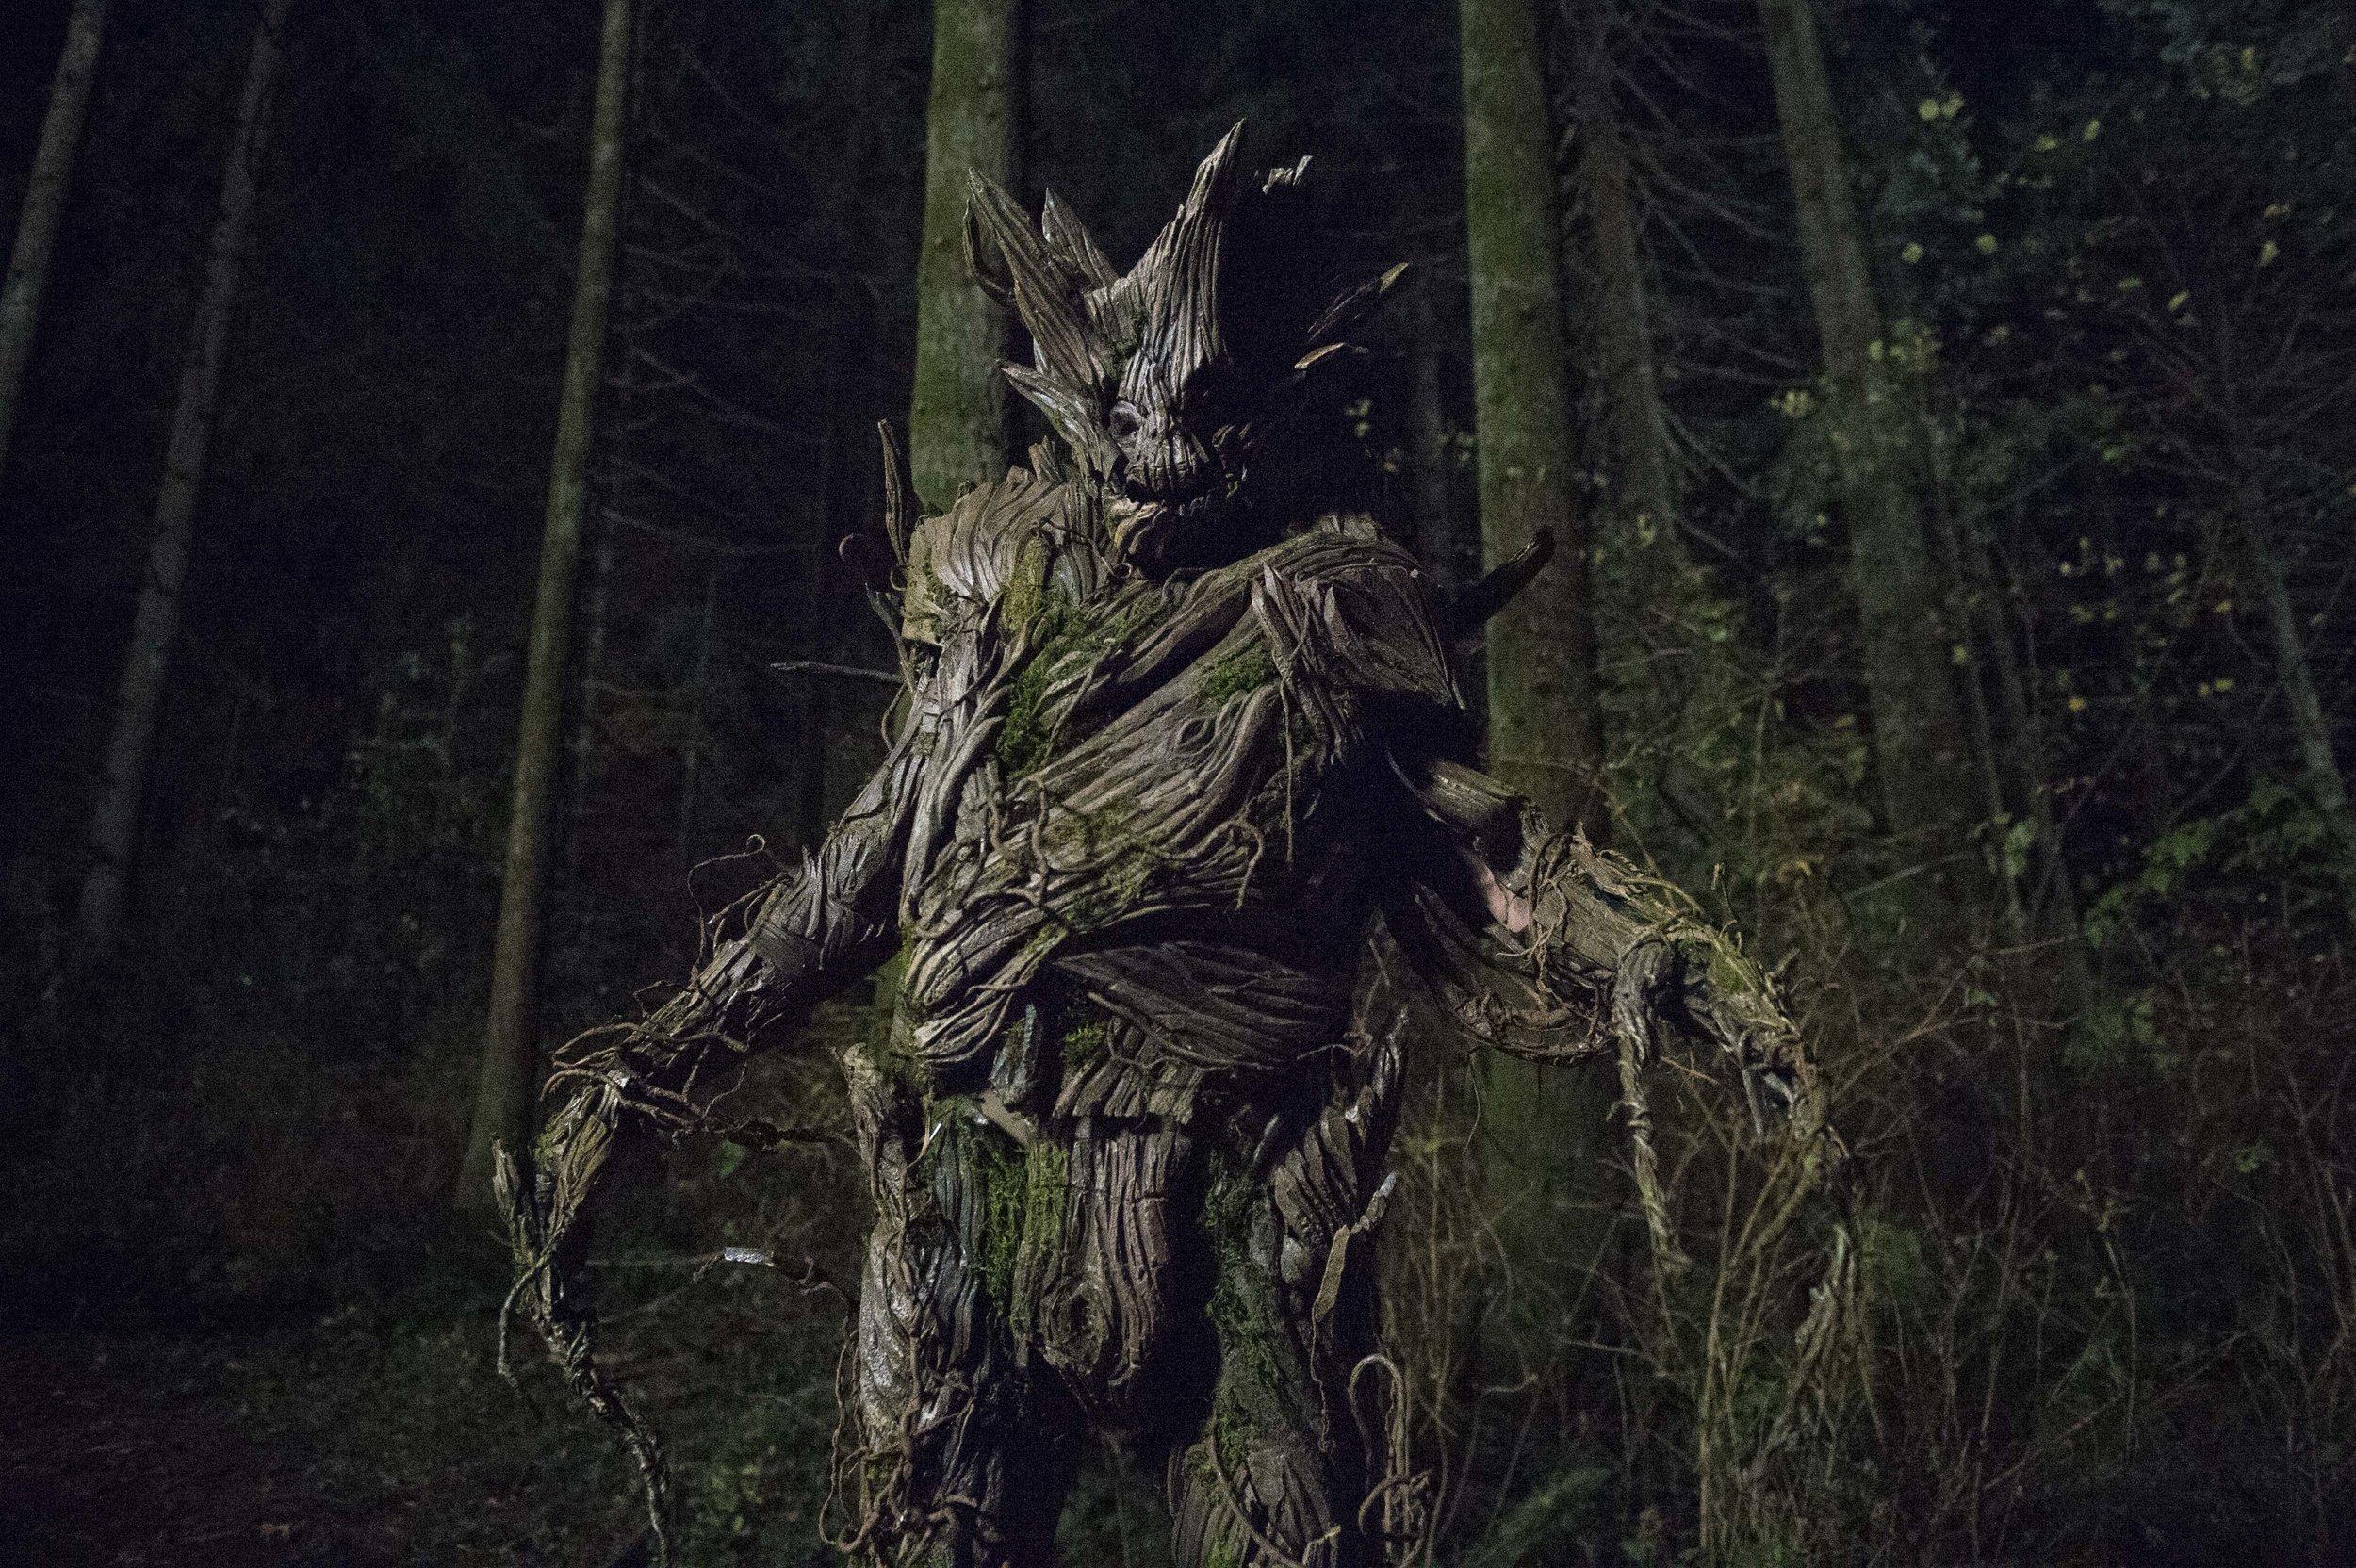 Scary Tree Monster.jpg